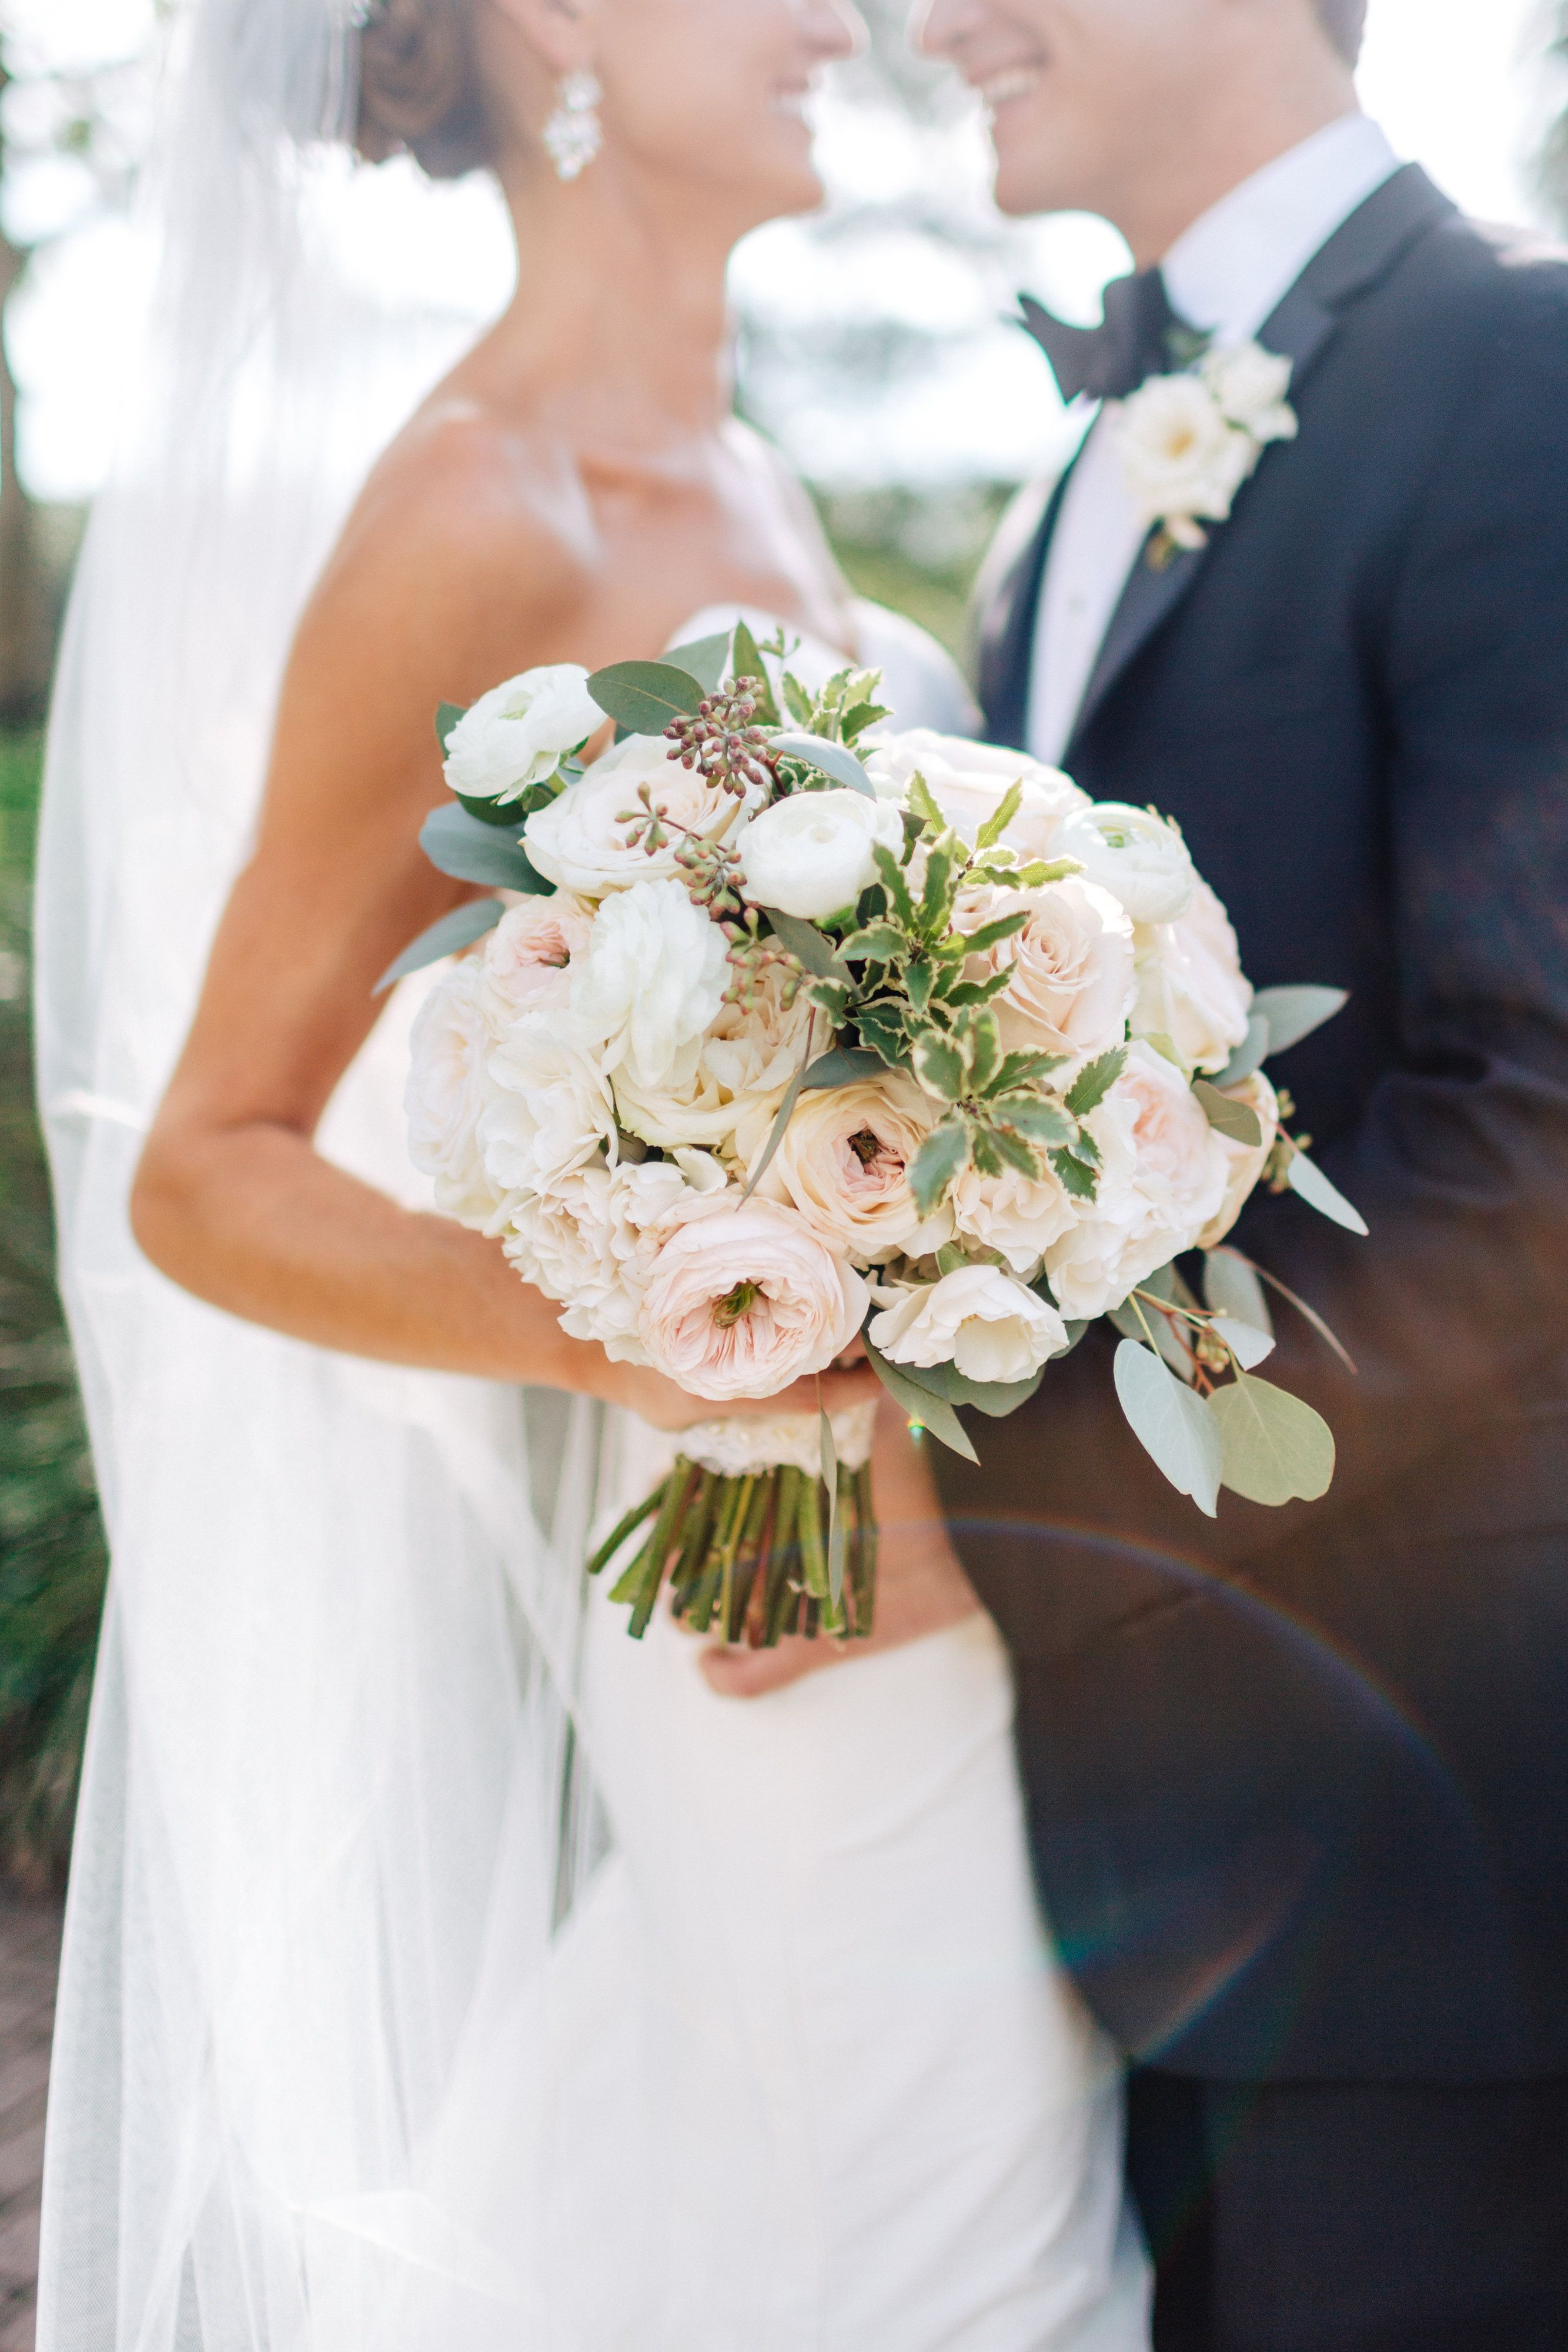 classic bridal bouquet of white ohara garden rose blush garden rosewhite - Blush Garden Rose Bouquet